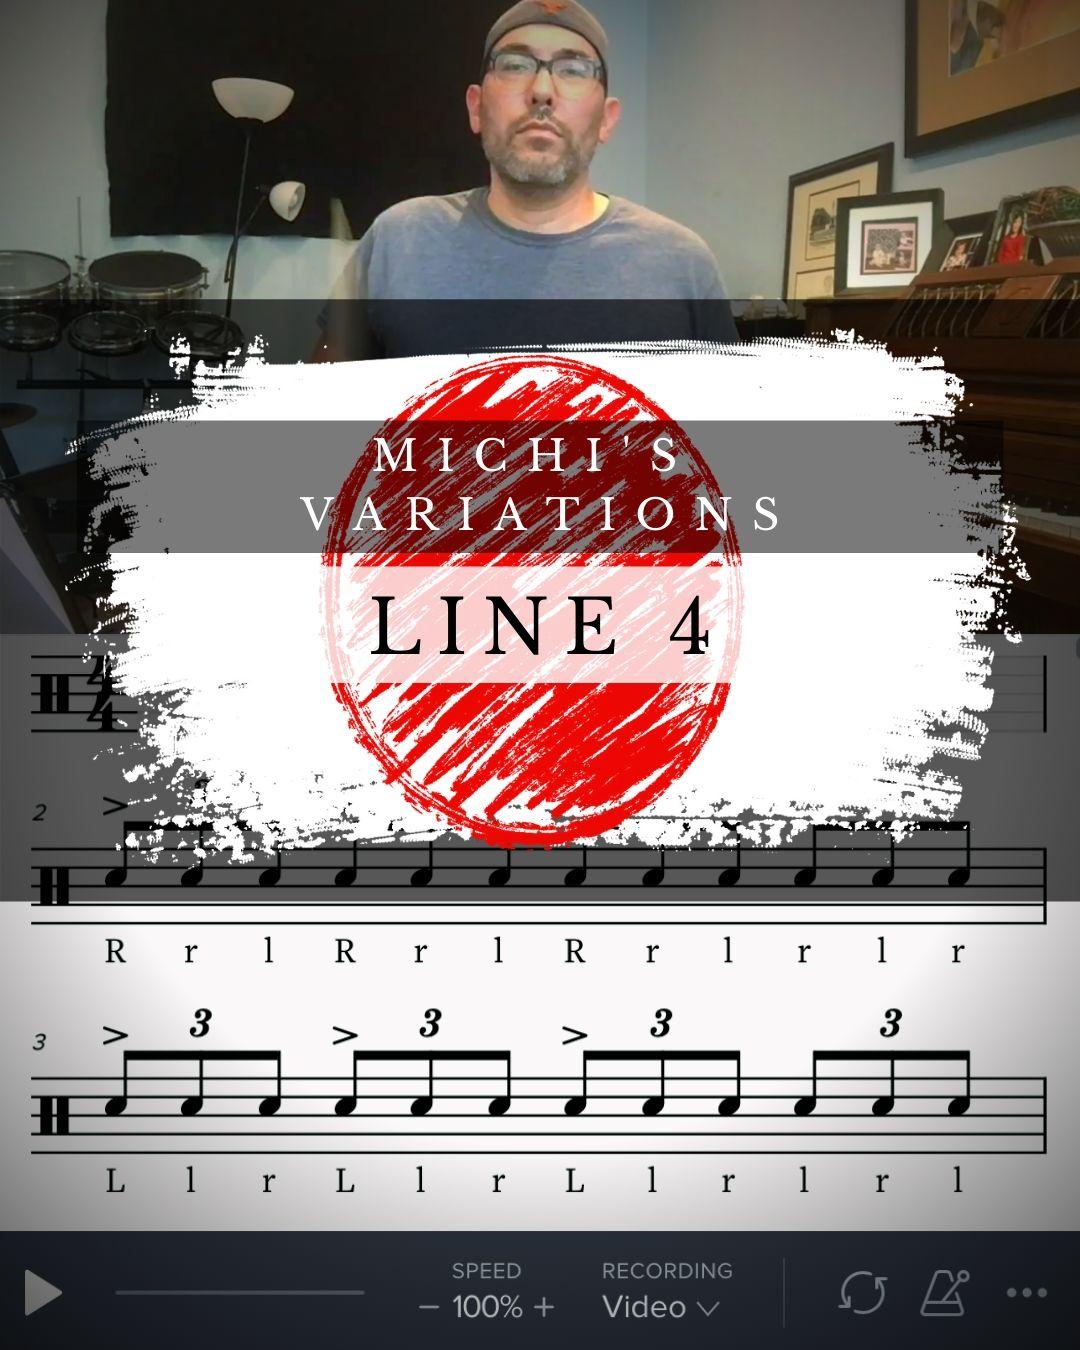 Michi's Variations Line 4